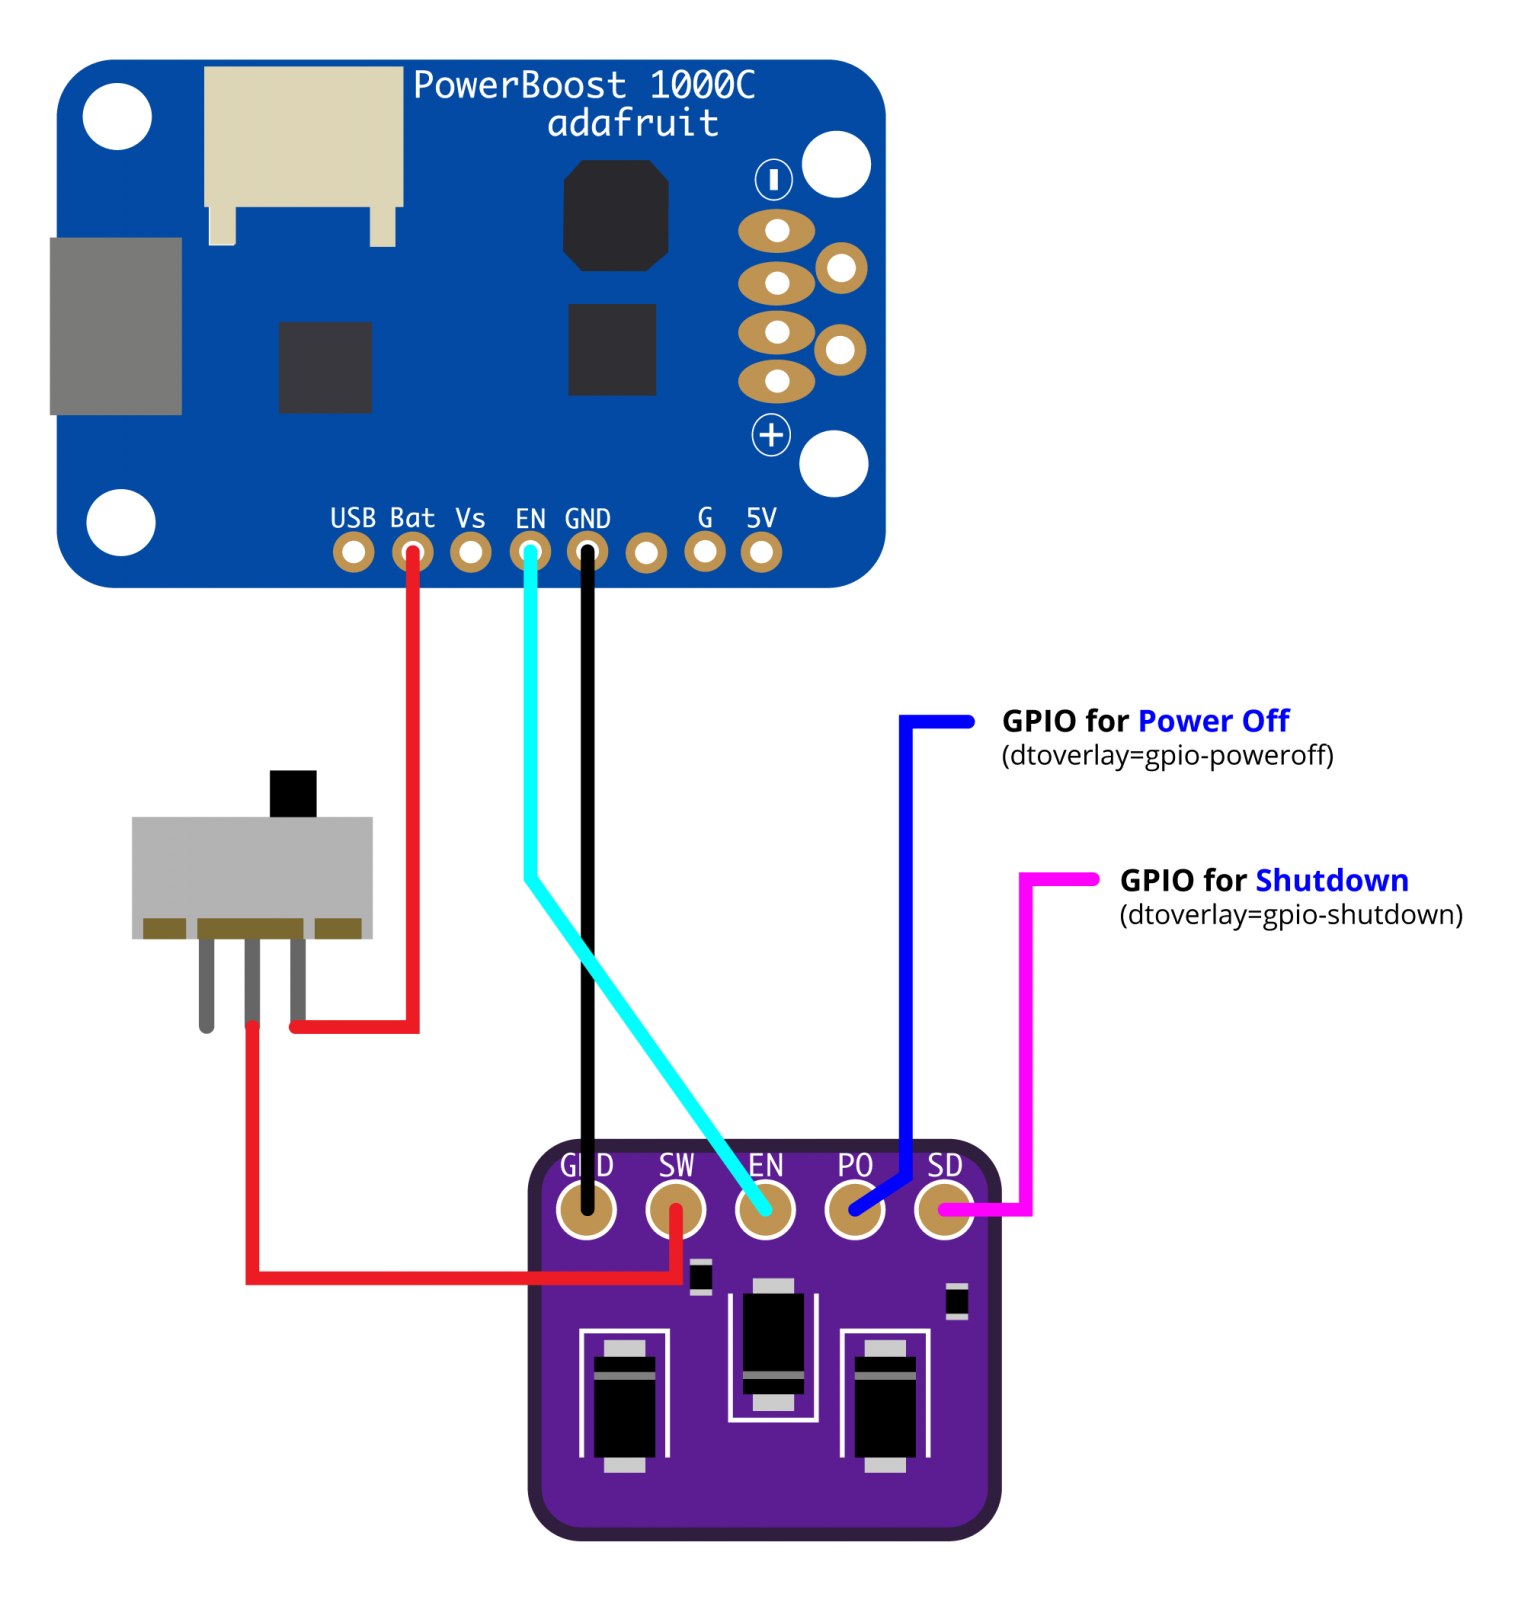 Raspberry Pi Safe Shutdown Board PowerBoost 1000c